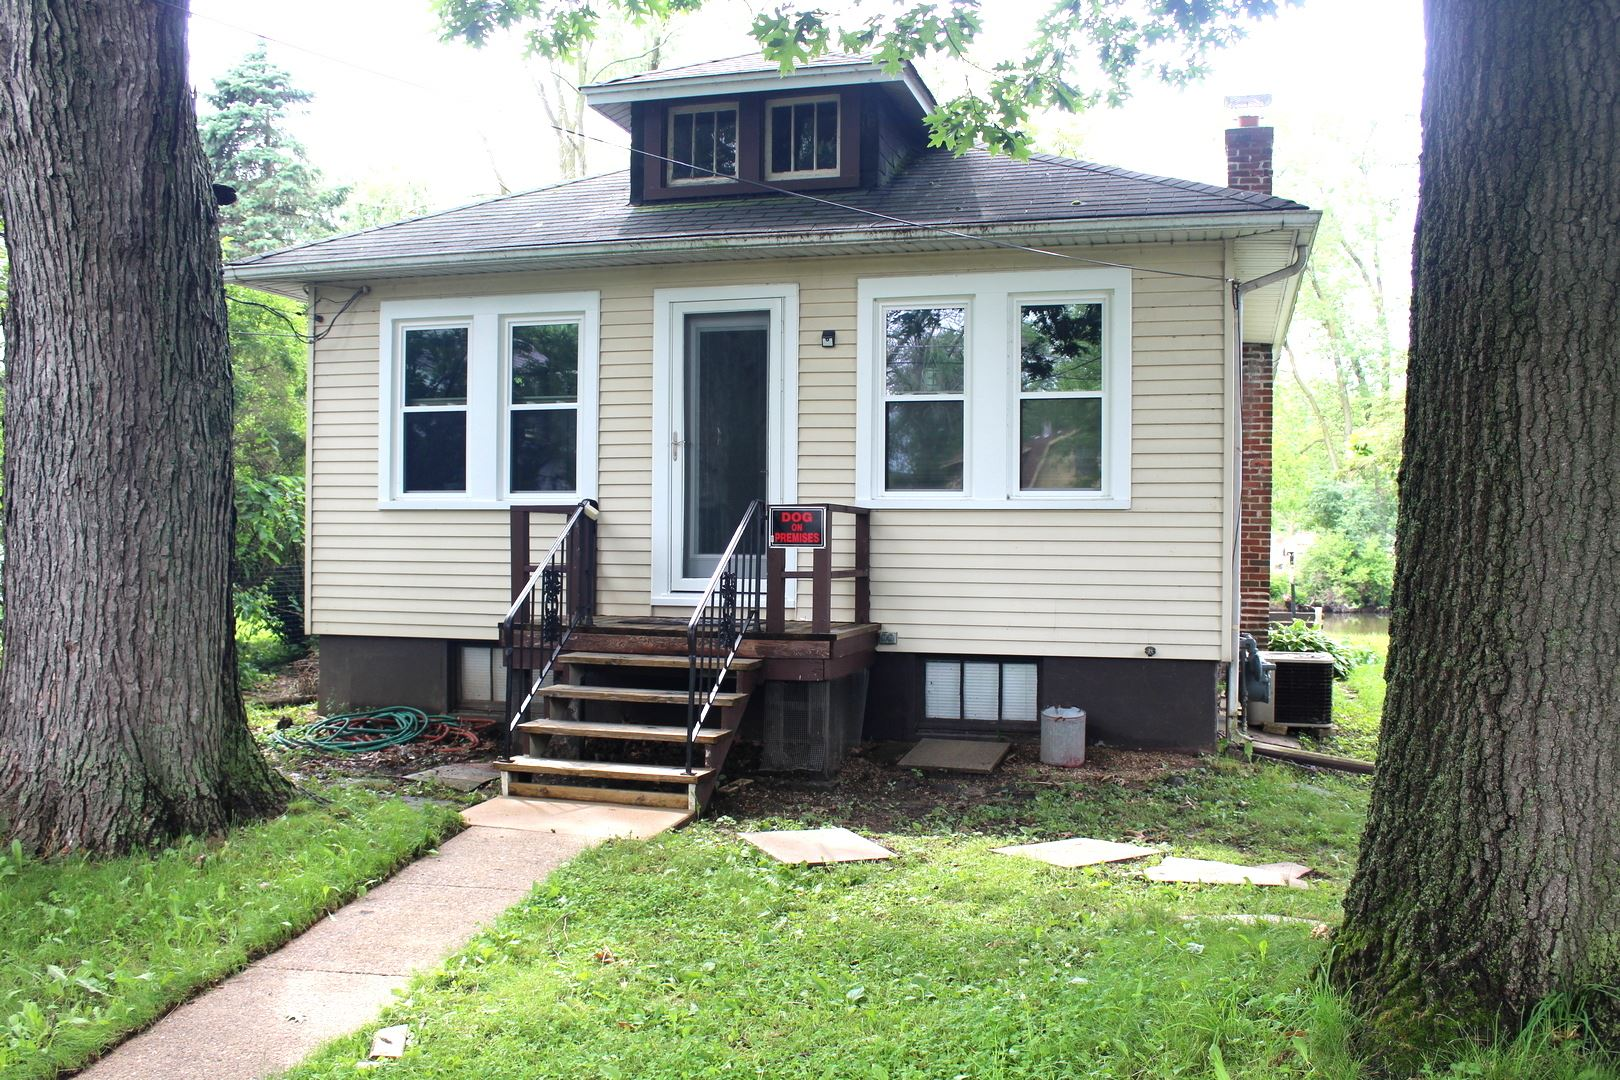 37630 N TERRACE Lane, Spring Grove, IL 60081 - #: 10434258